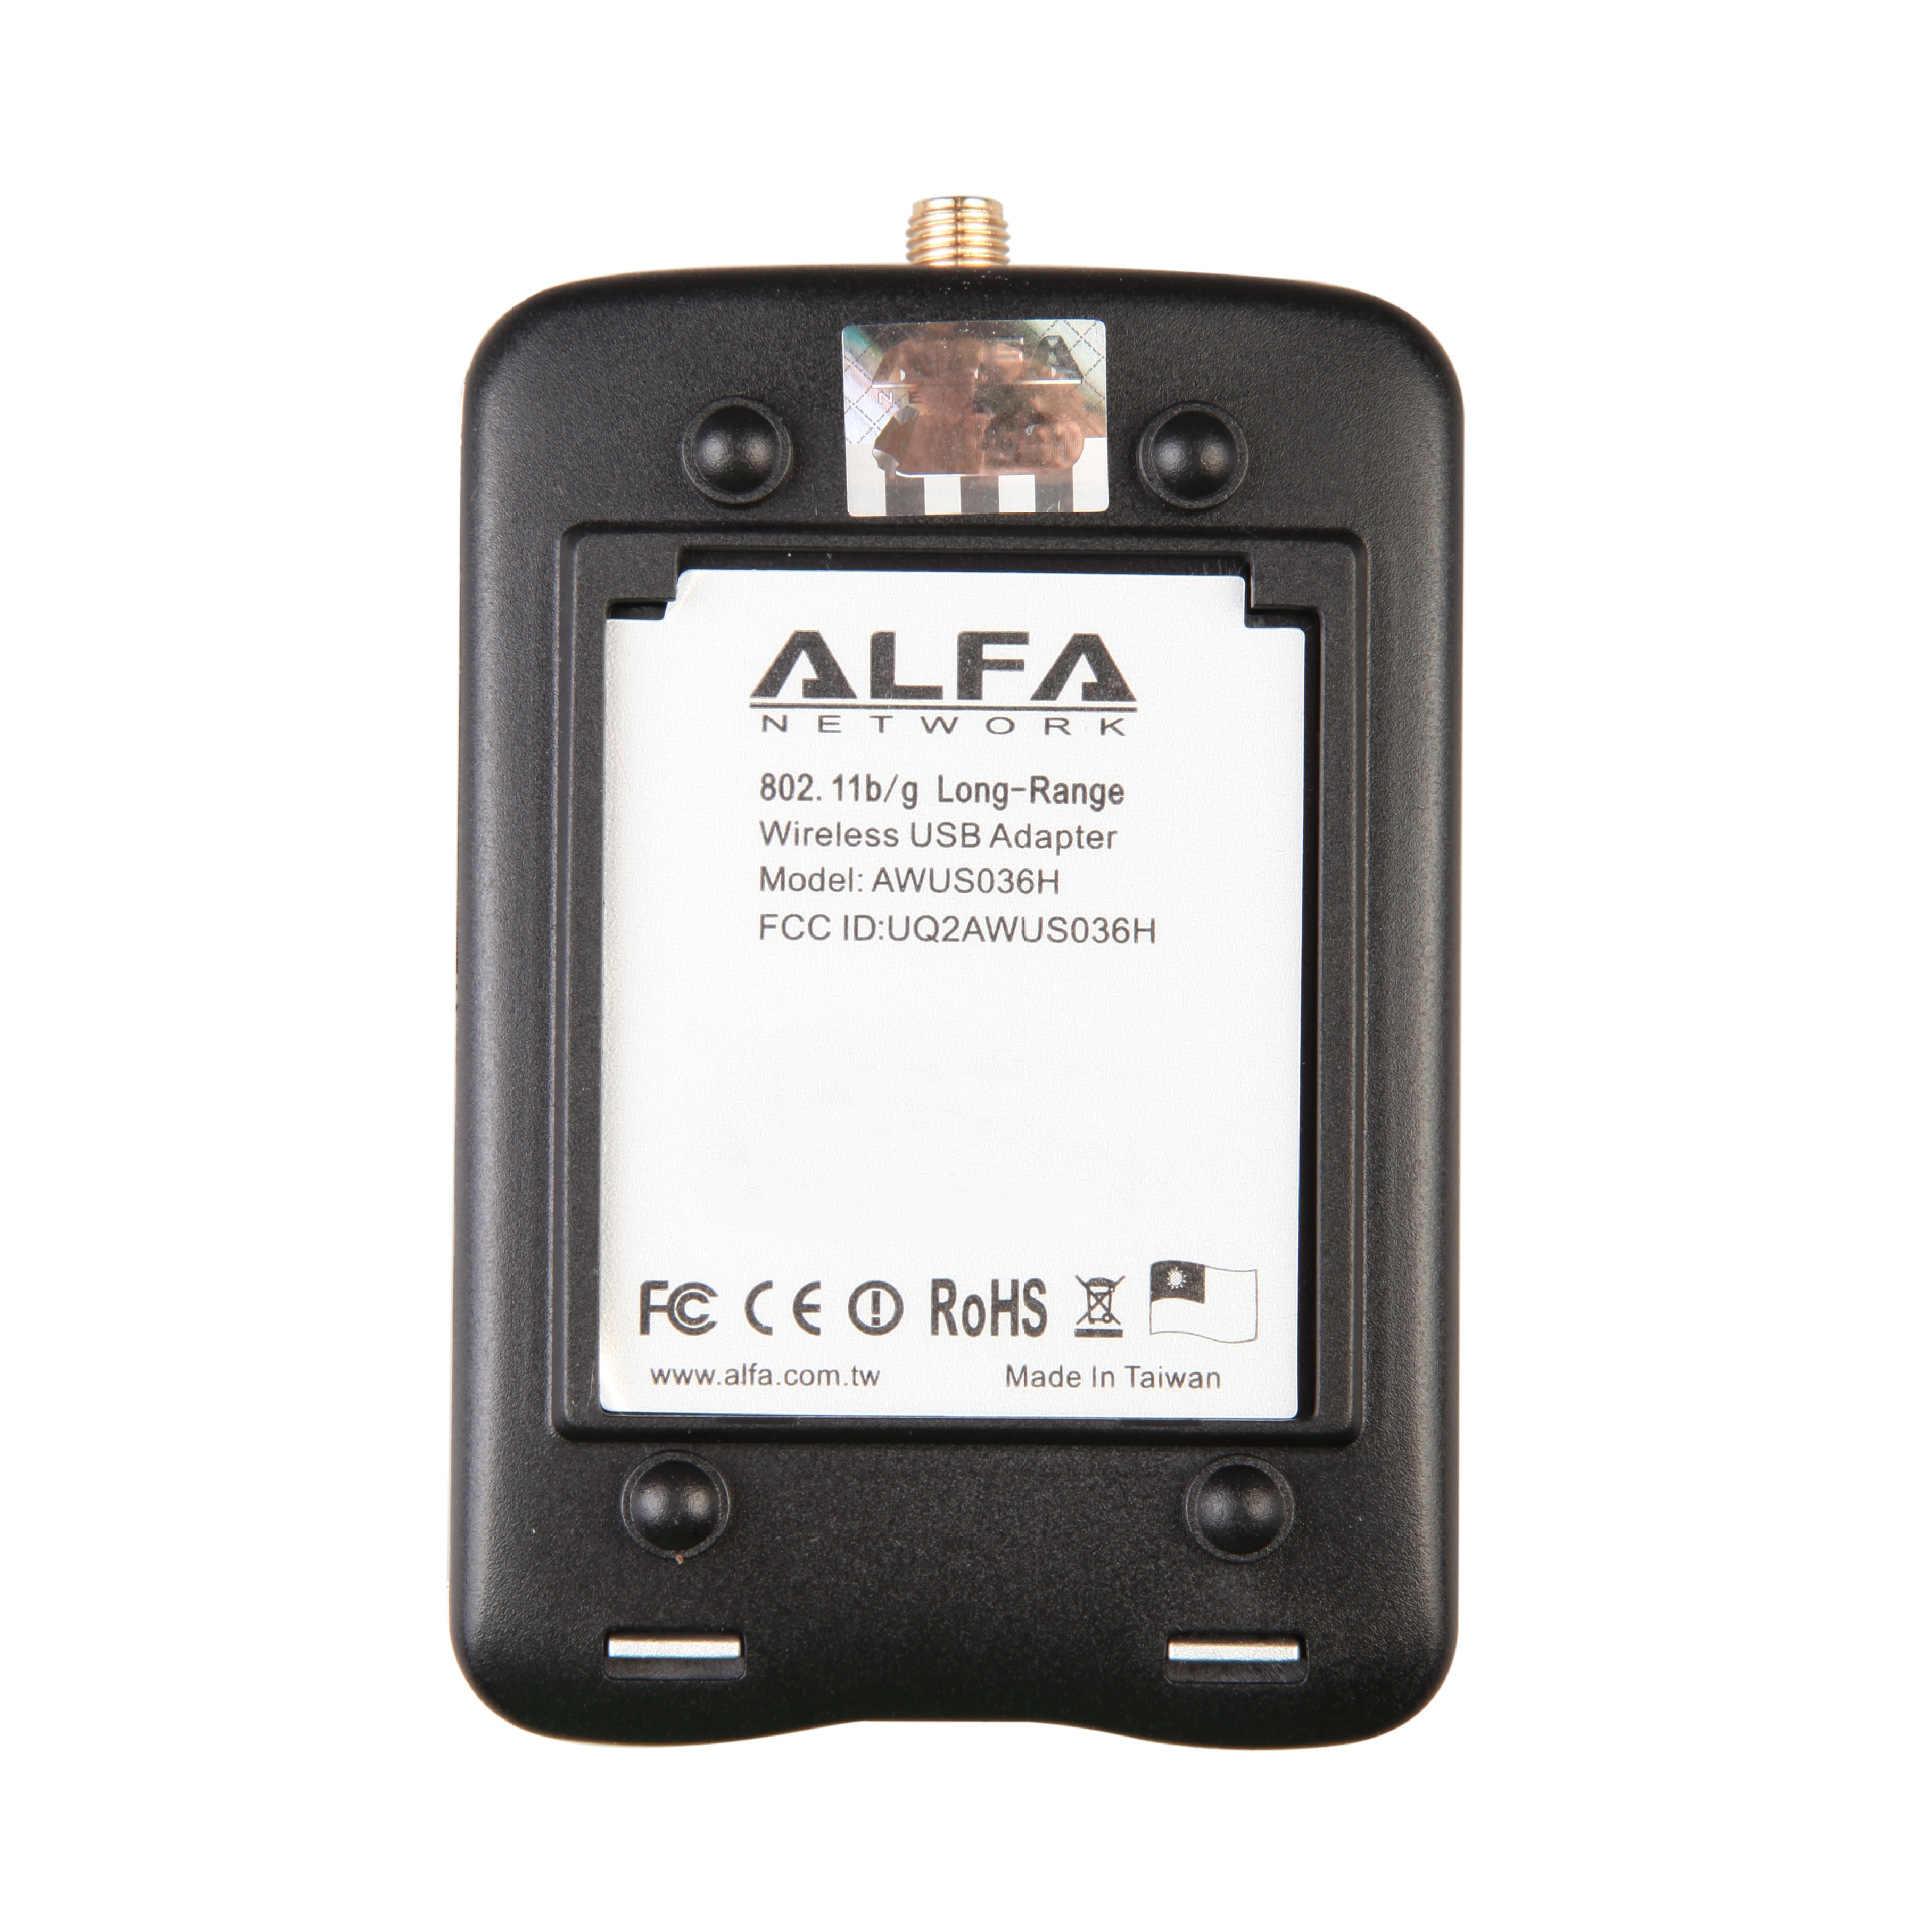 ALFA AWUS036H Realtek RTL8187L Chipset 2000mW sans fil USB Wifi adaptateur 54Mbps sans fil USB carte Wifi